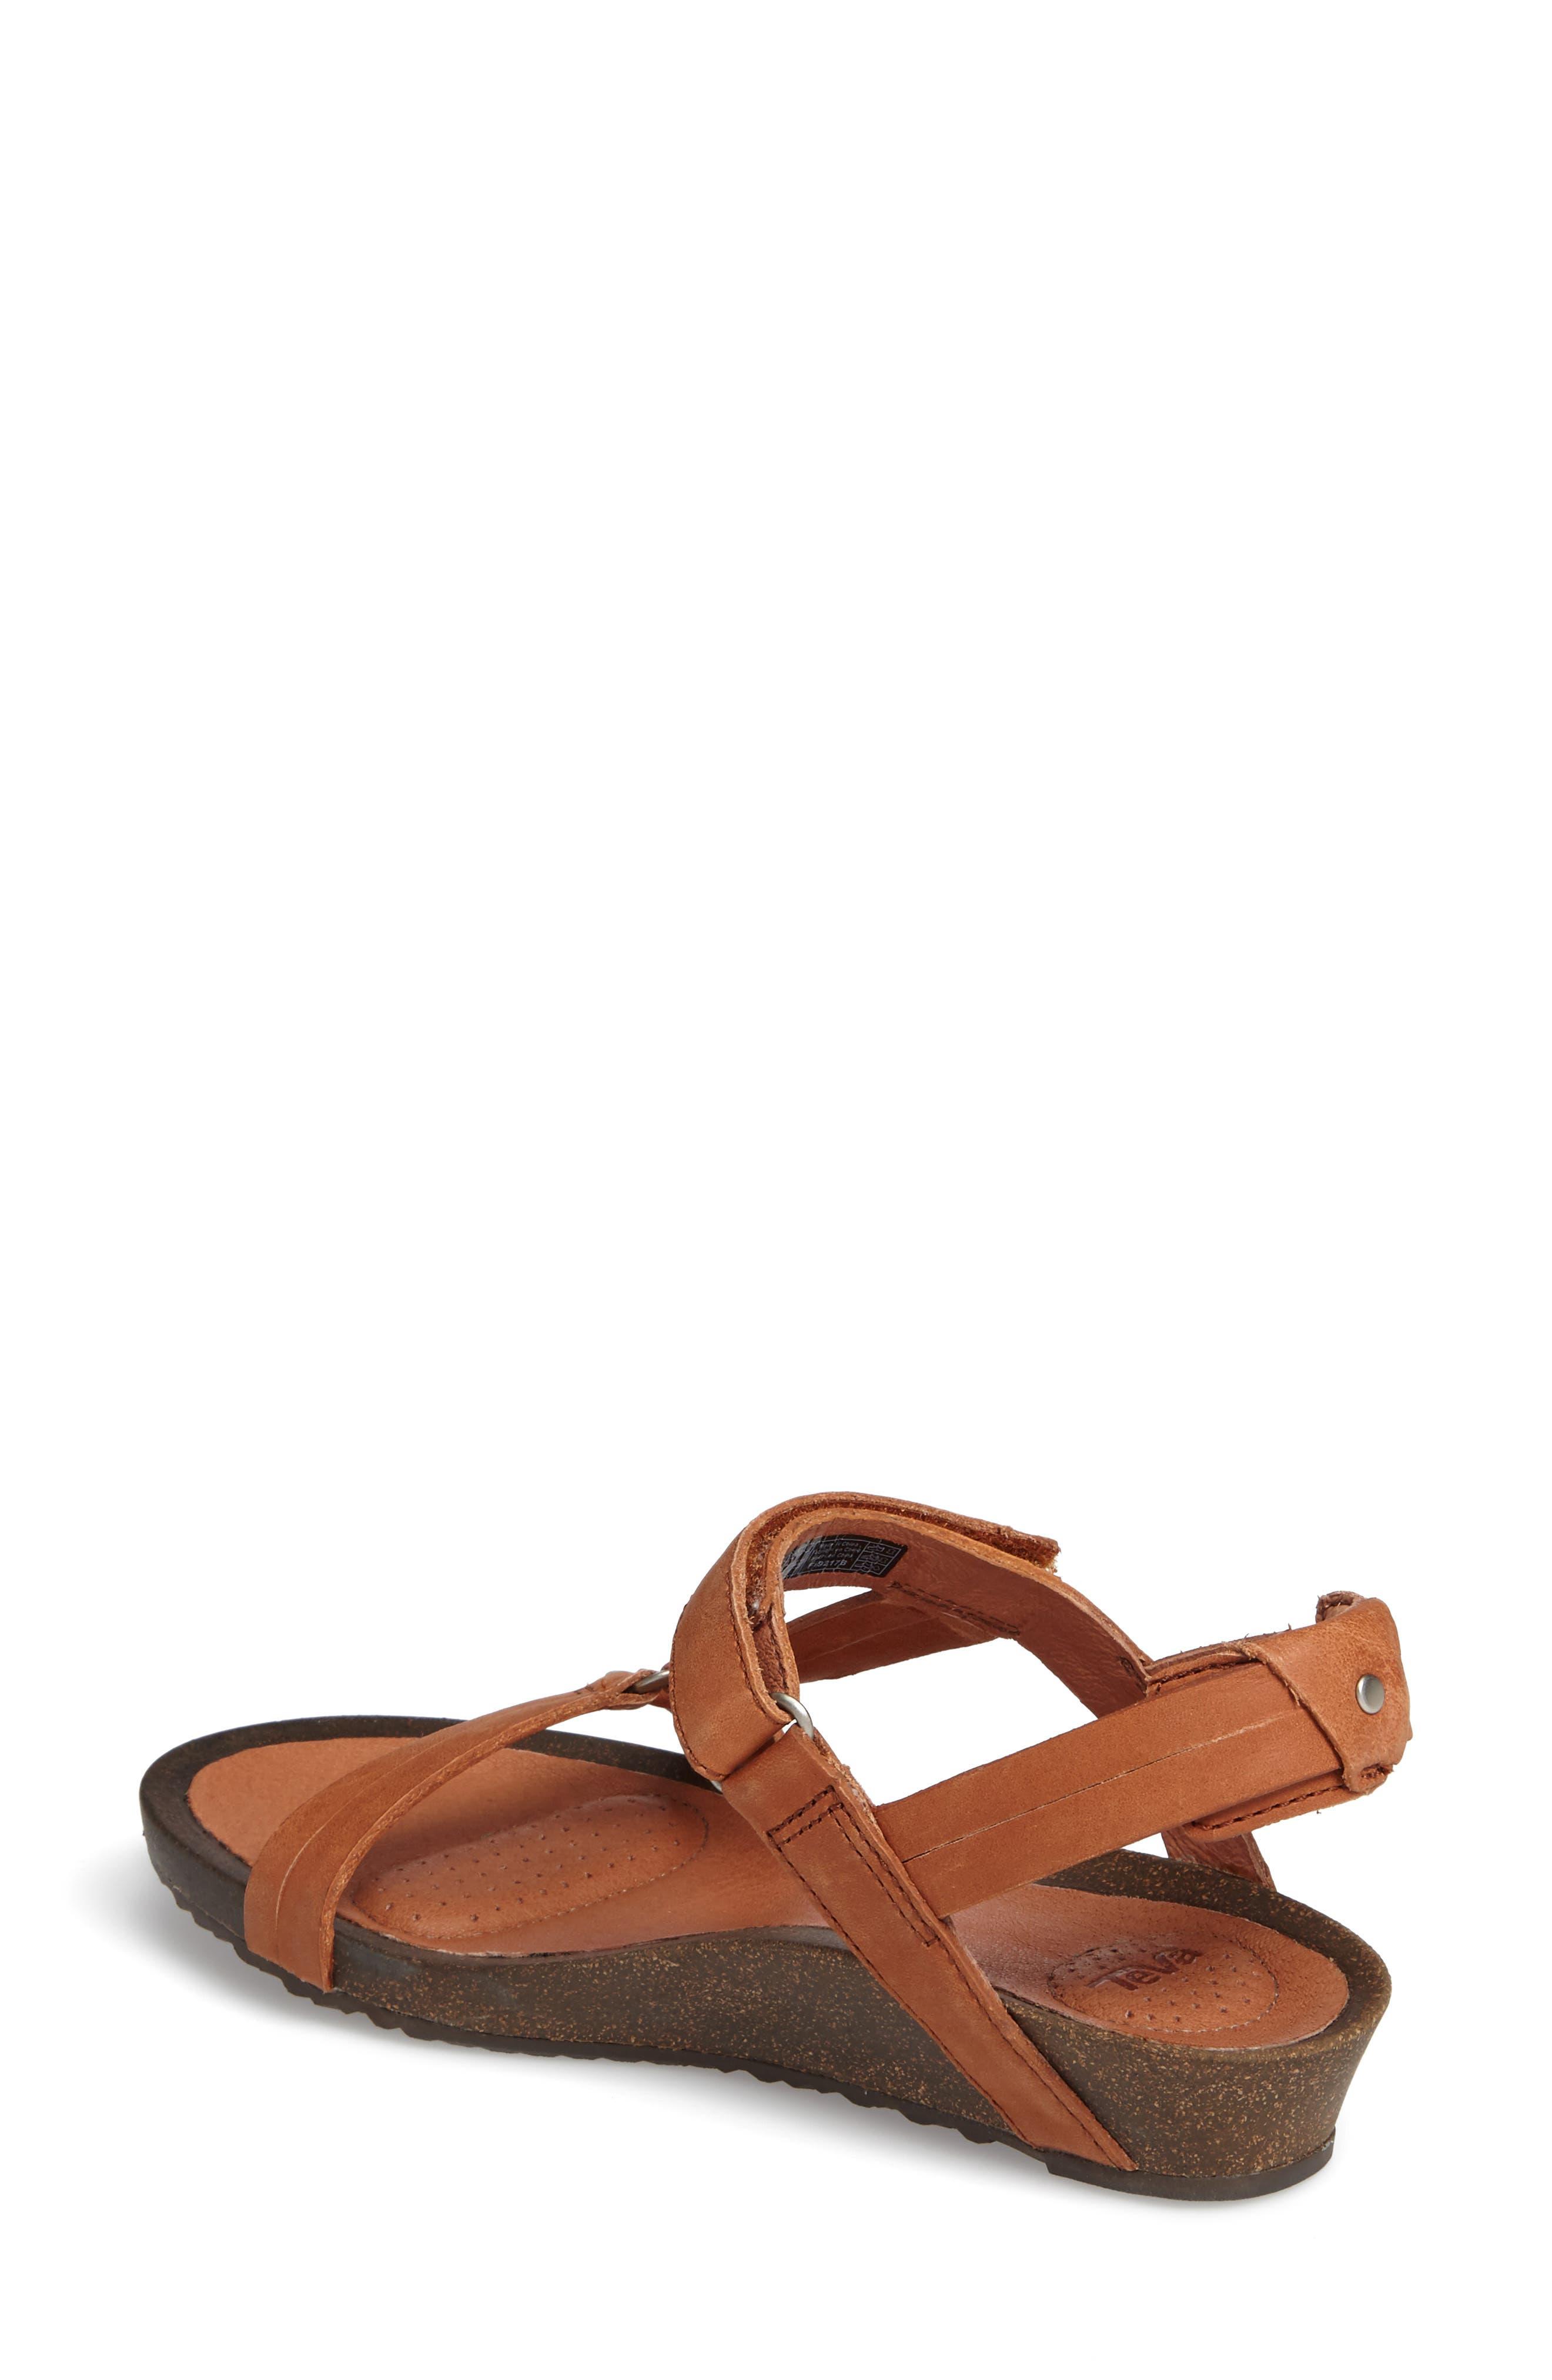 Ysidro Universal Sandal,                             Alternate thumbnail 4, color,